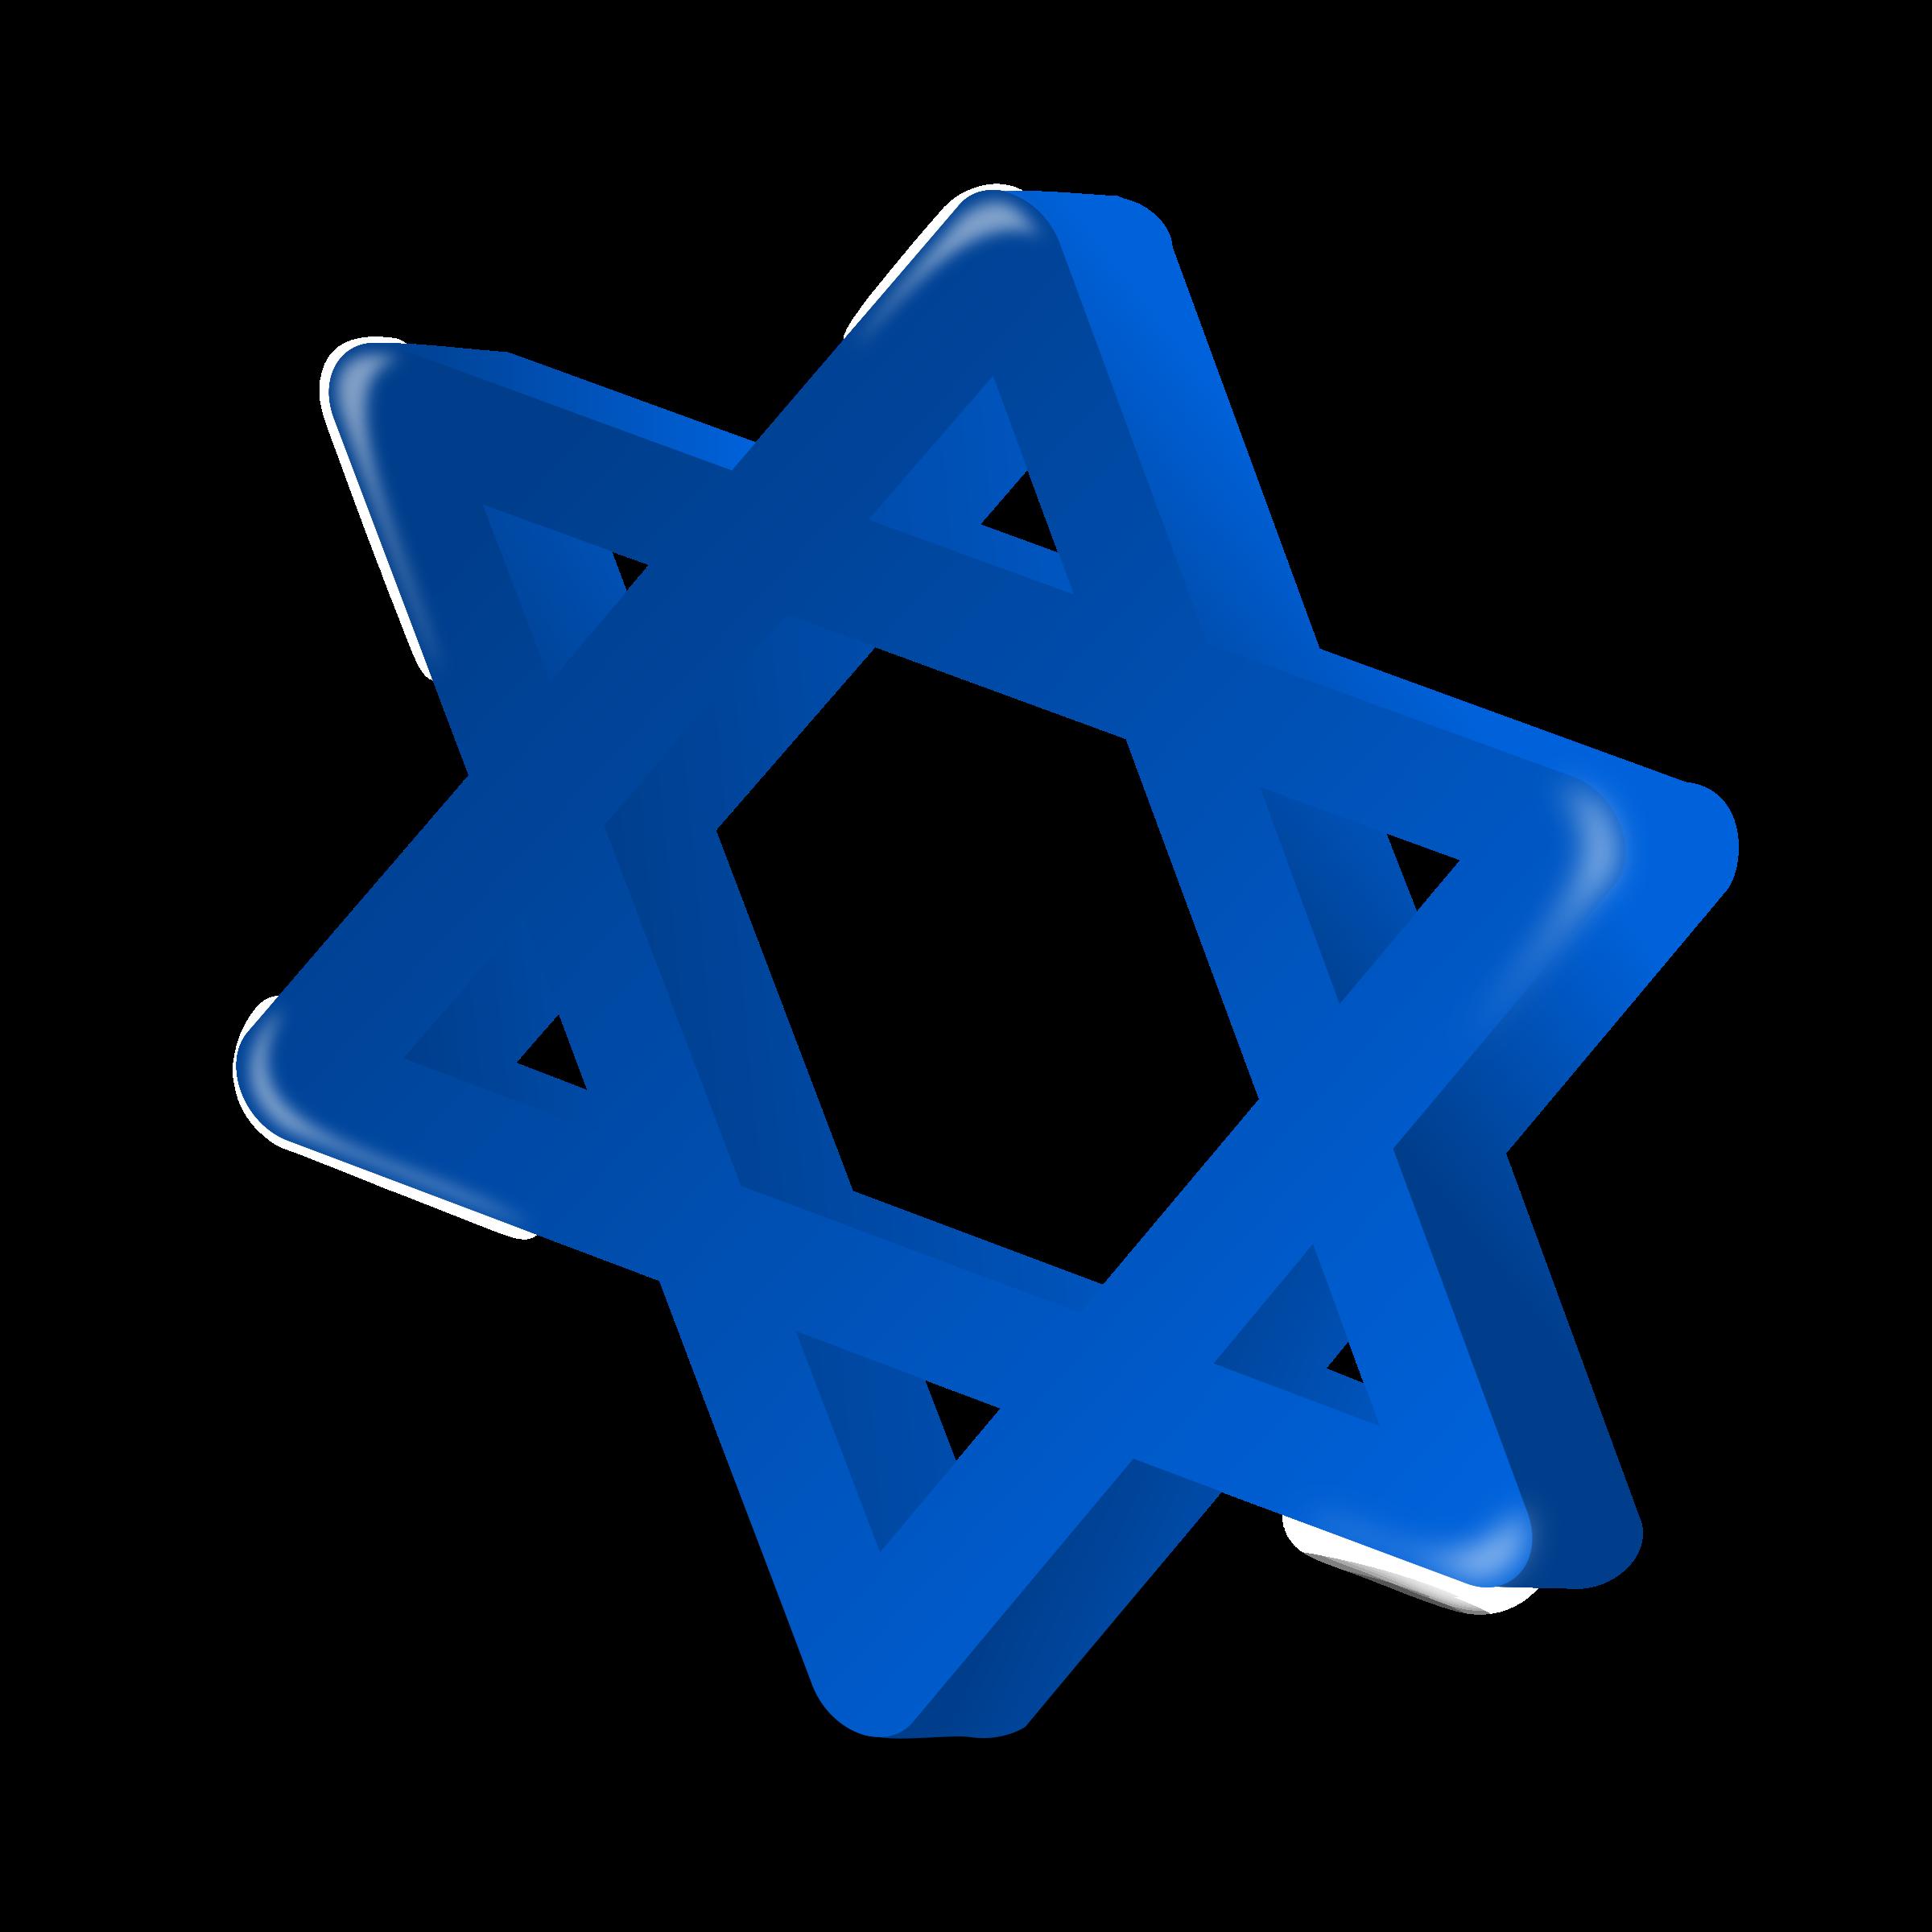 Clipart star hanukkah. Icon big image png